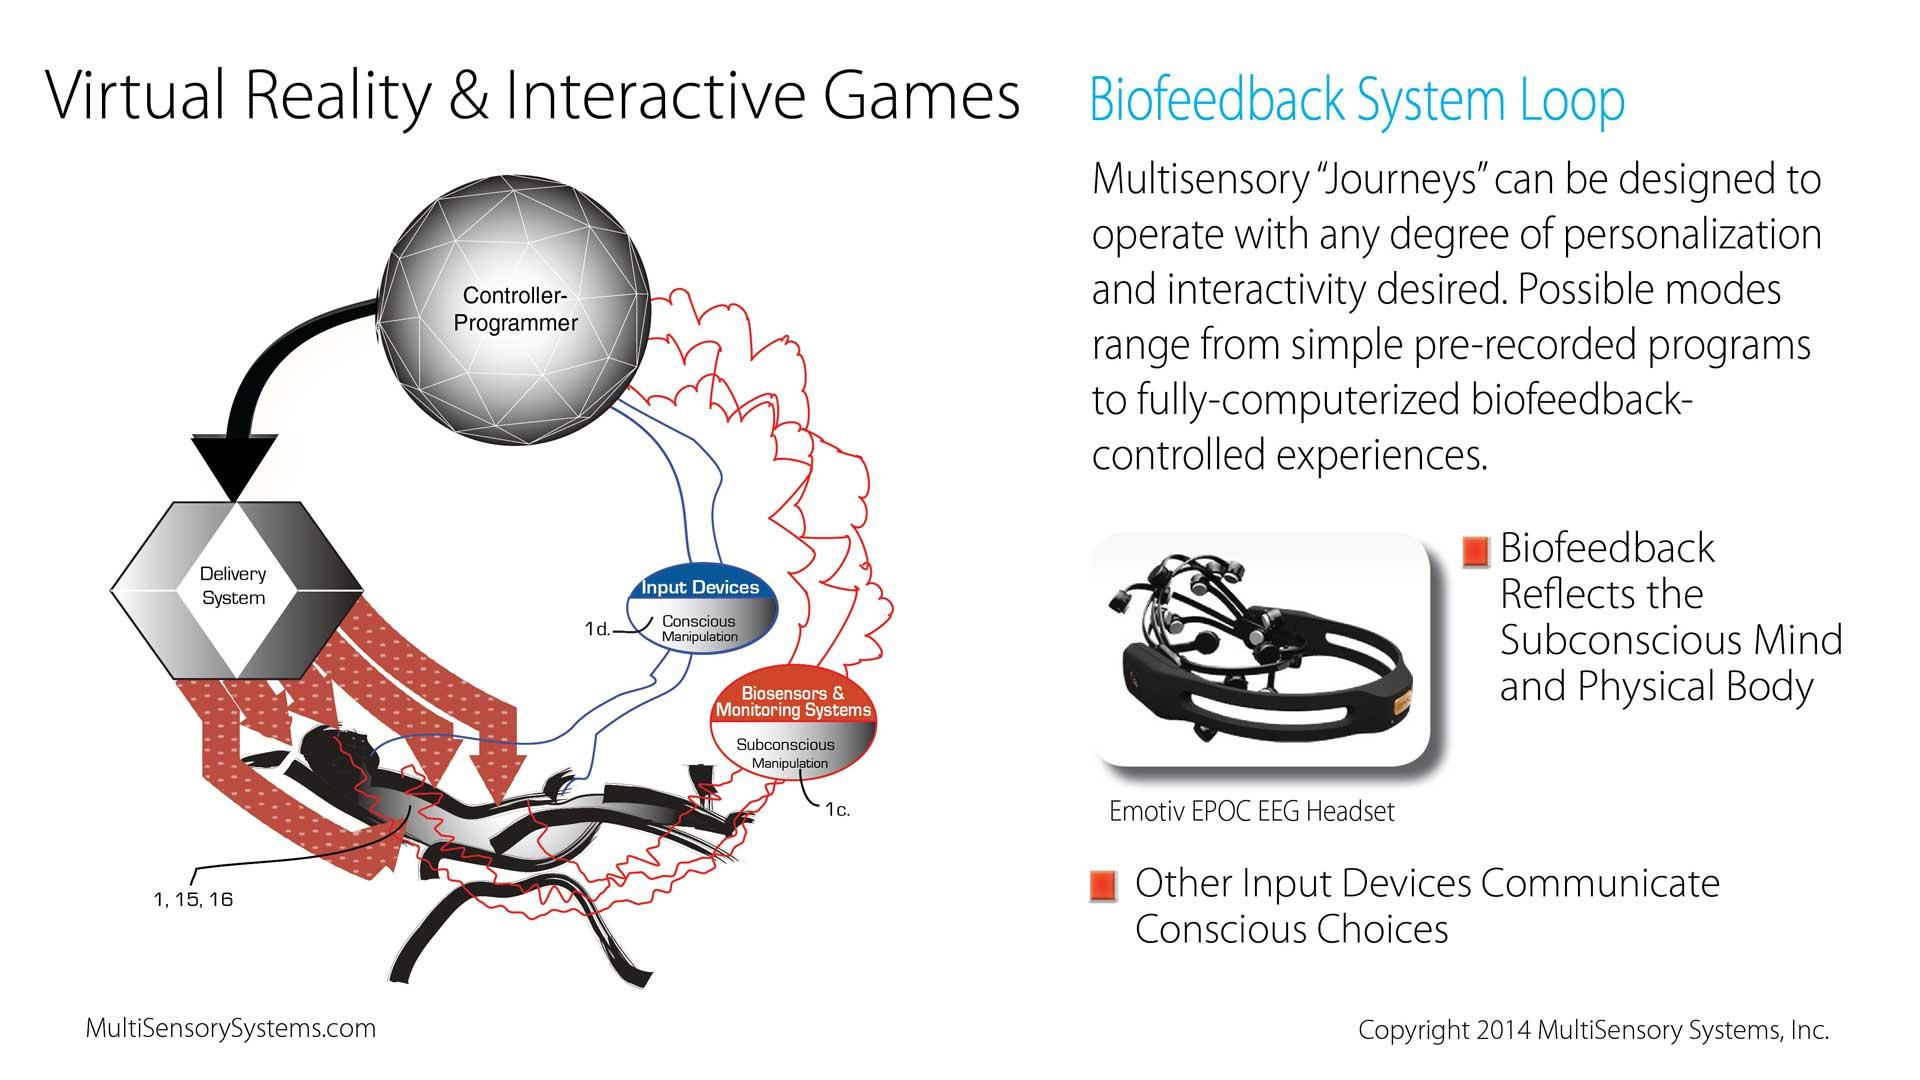 Biofeedback System Loop